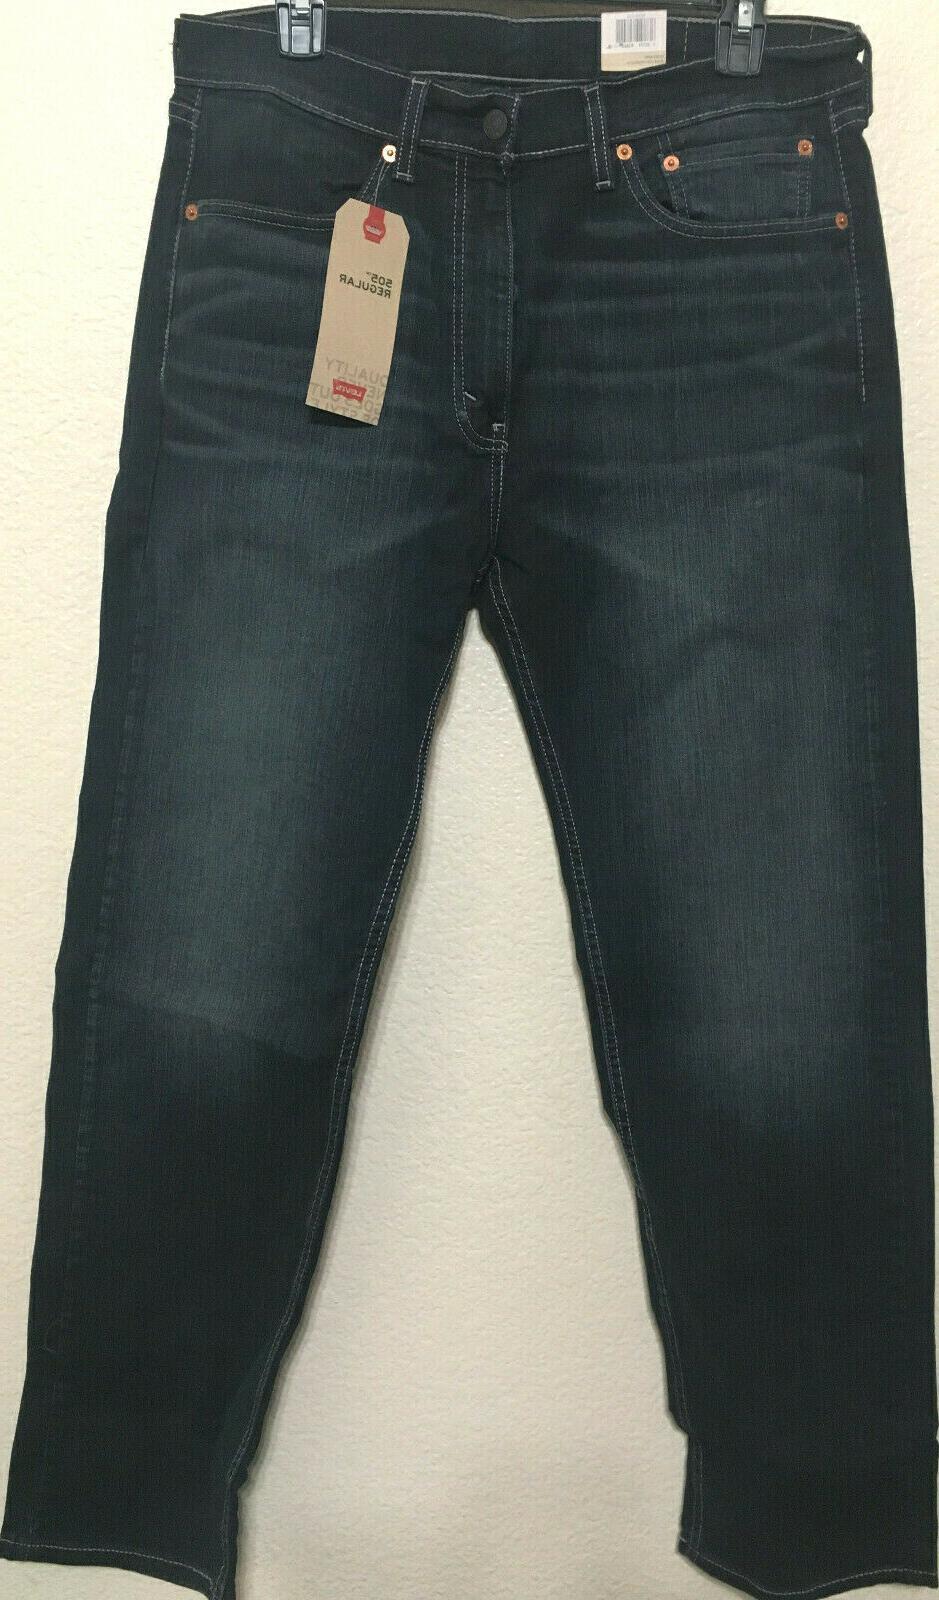 NWT MEN LEVI'S 1330 REGULAR FIT STRAIGHT LEG JEANS D.BLUE STRETCH